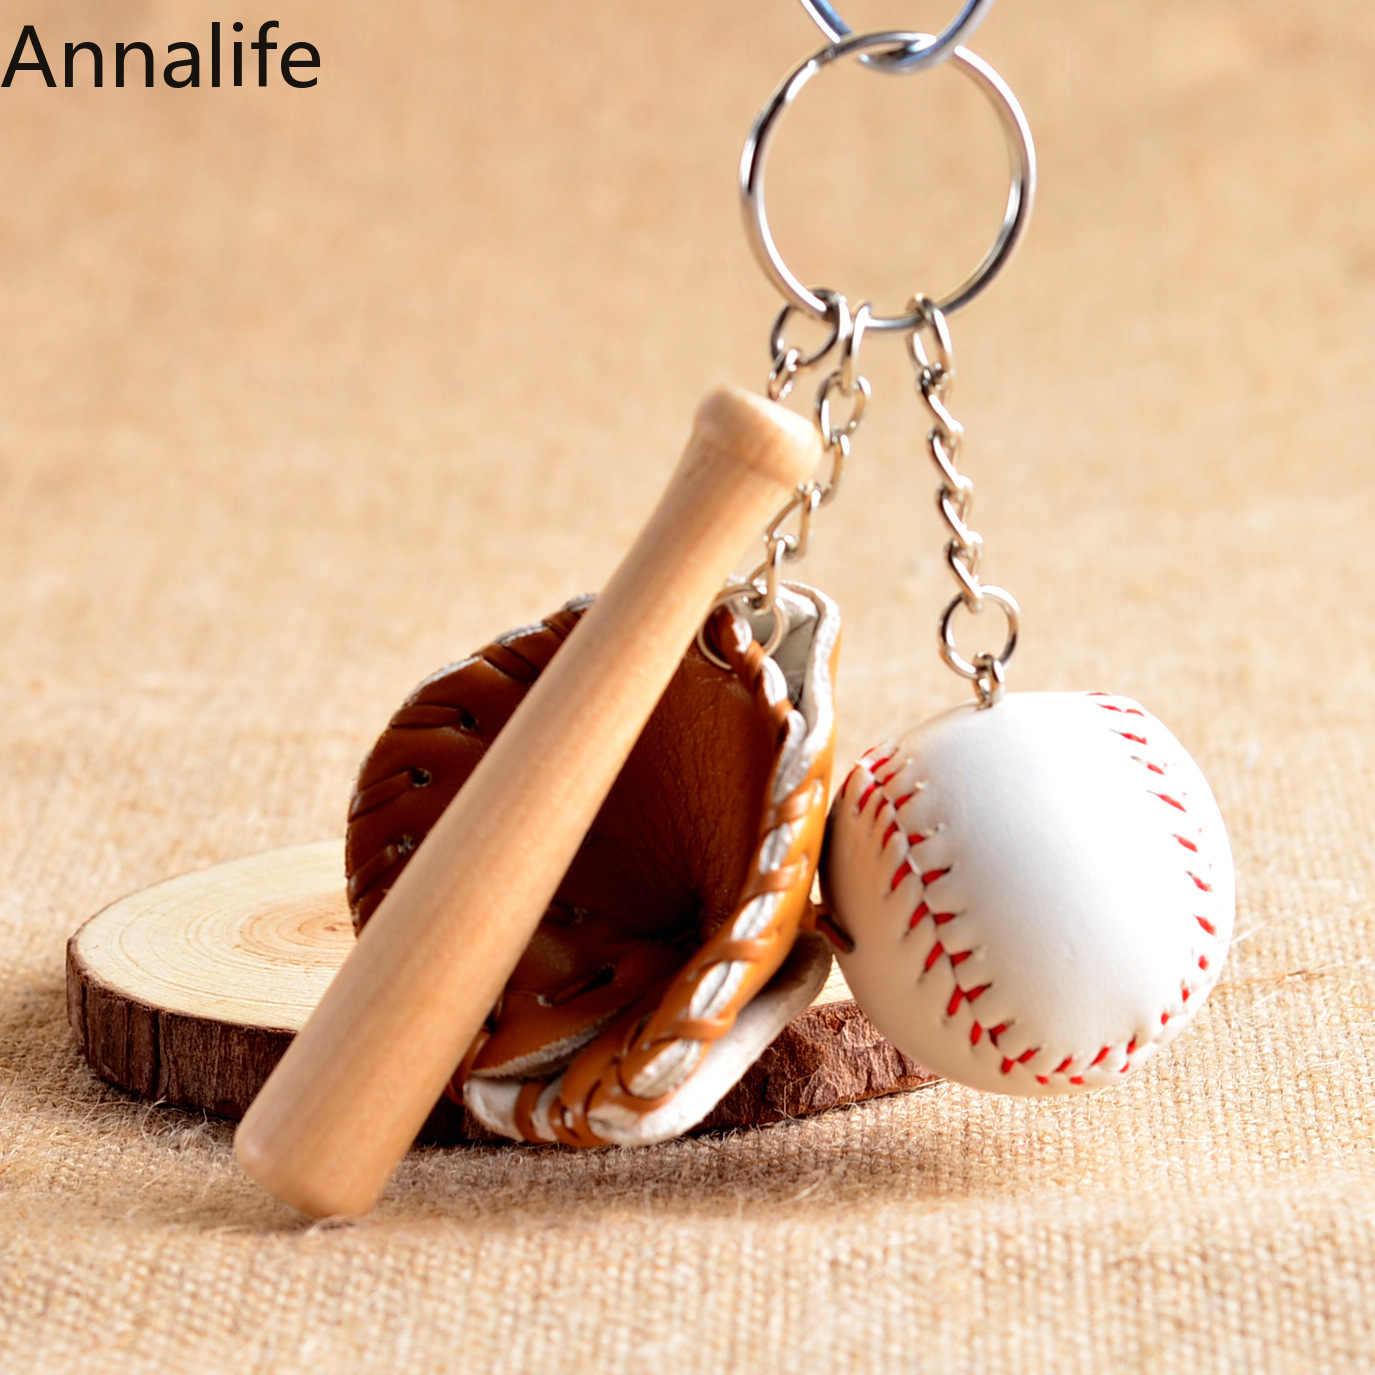 2019 Baru Mini Tiga Potong Baseball-Sarung Tangan Kayu Bat Gantungan Kunci Mobil Gantungan Kunci Gantungan Kunci Hadiah pria Wanita Grosir